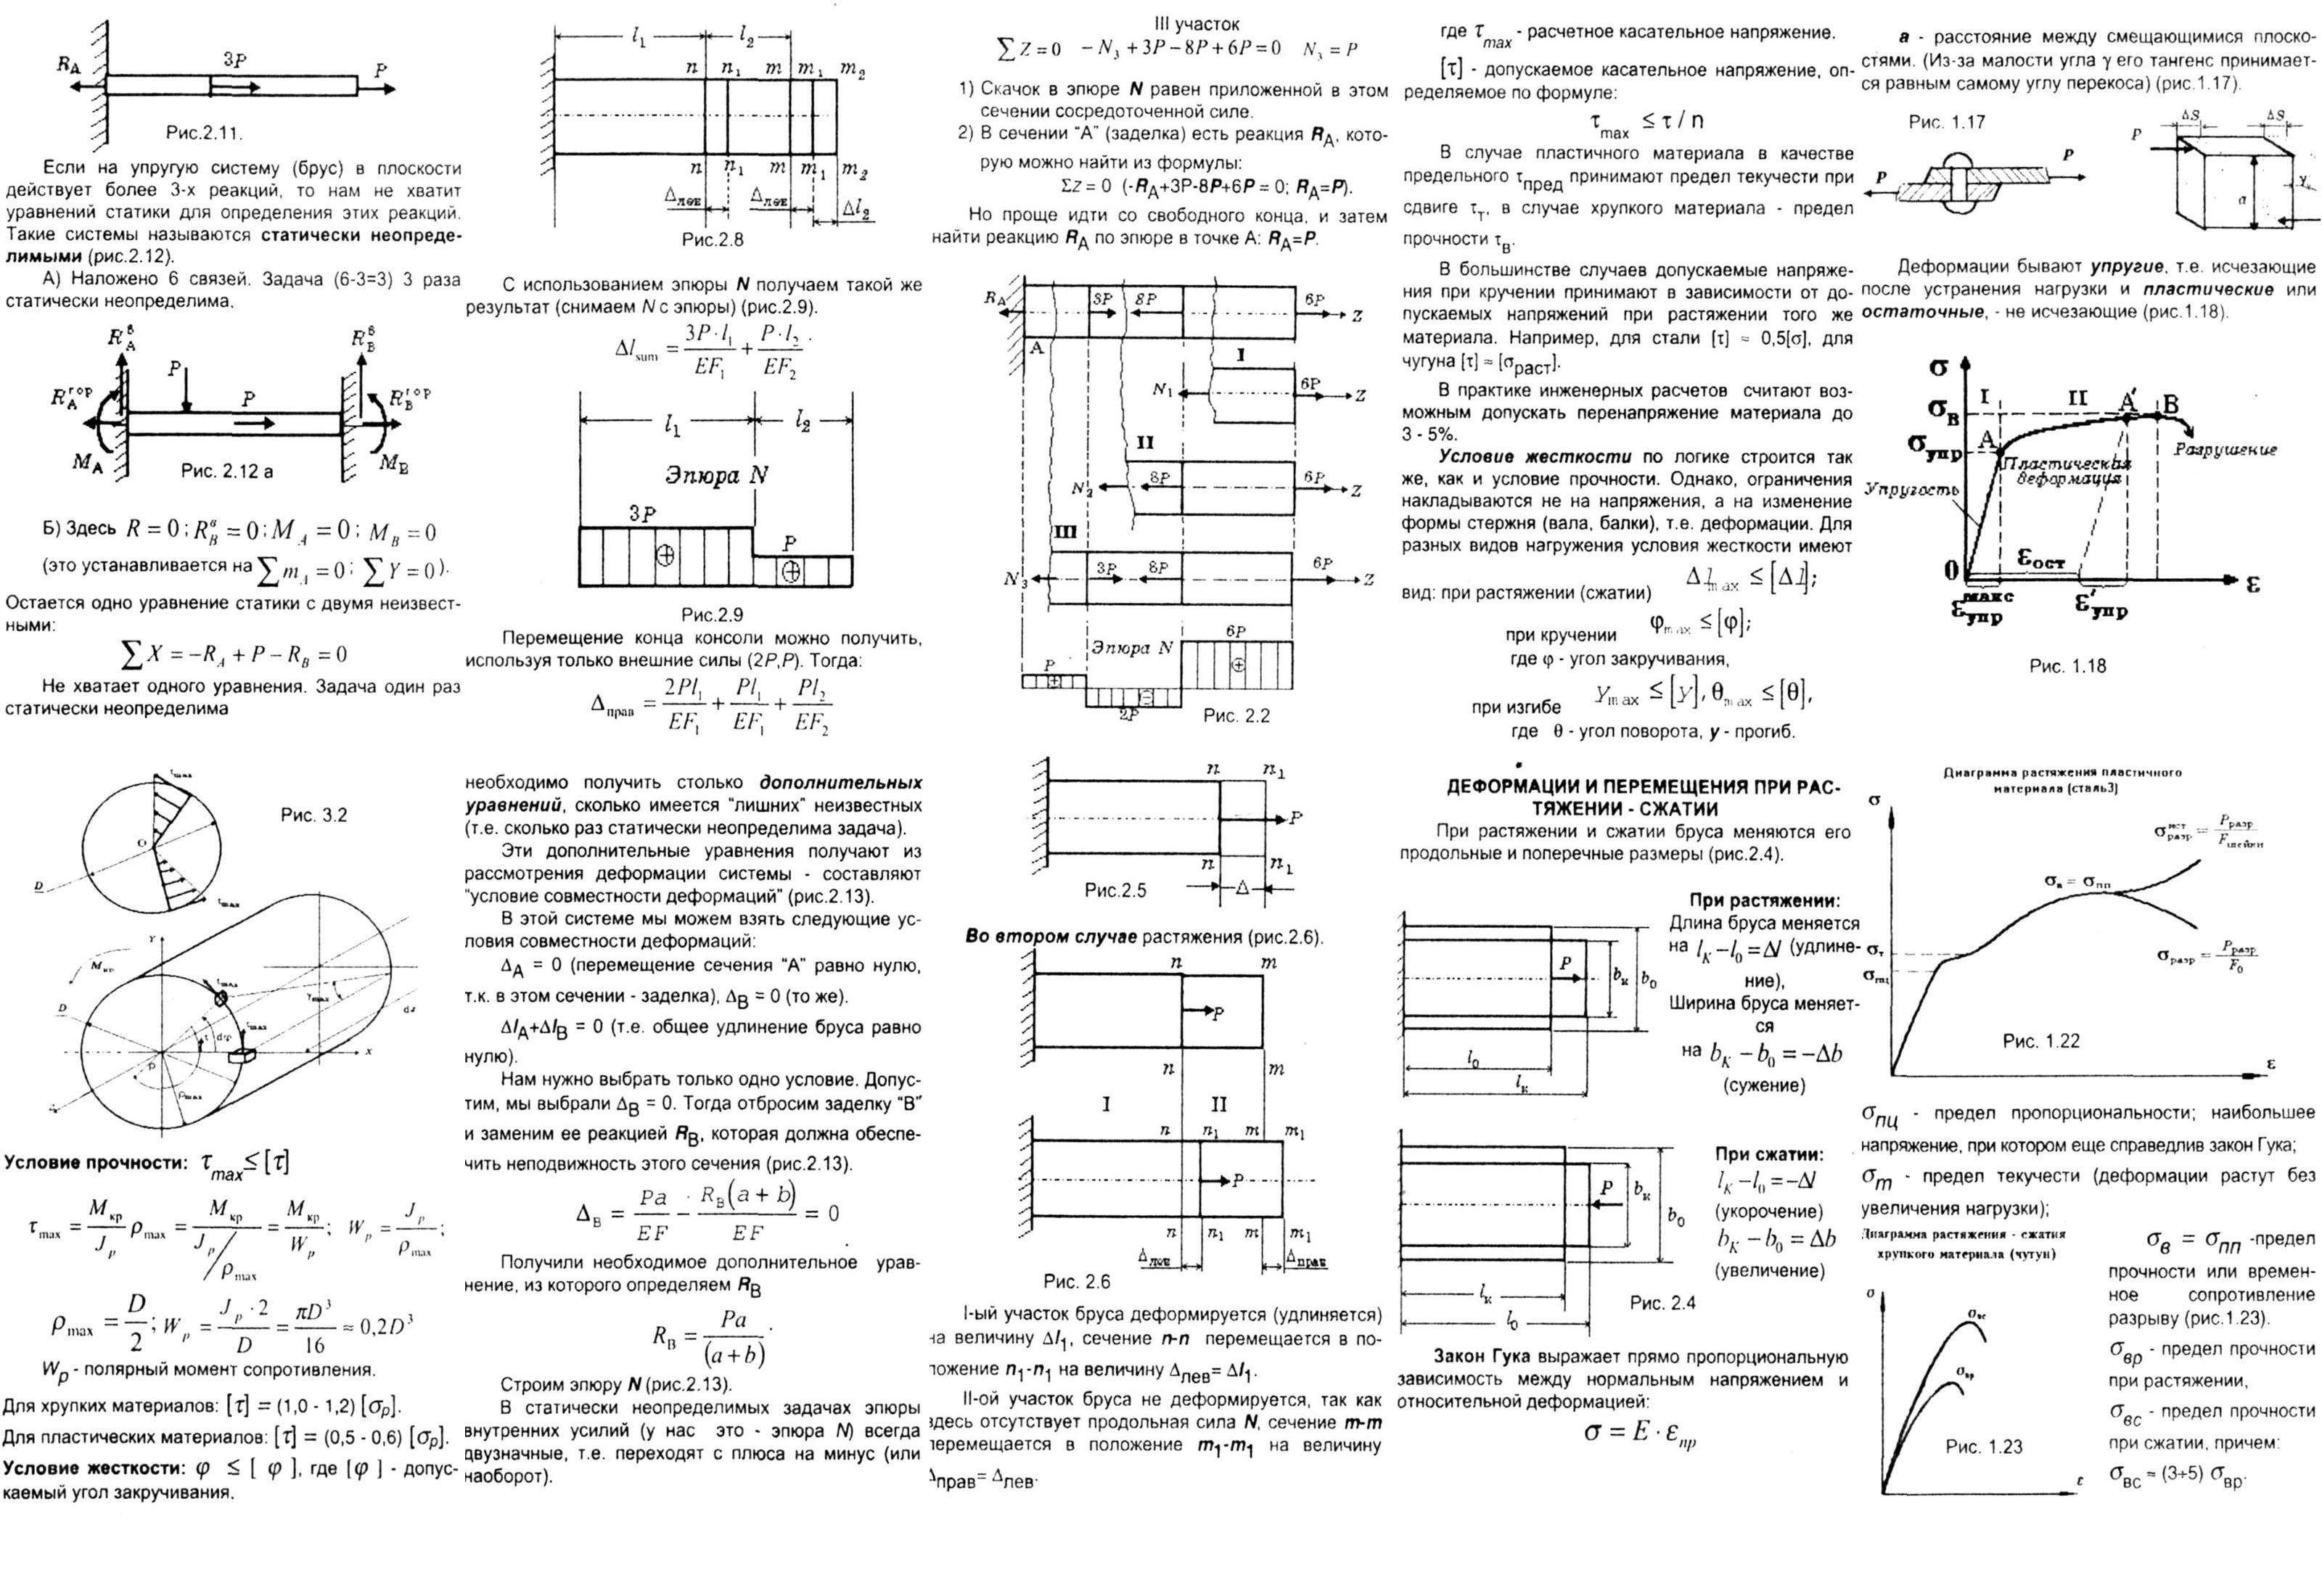 sopromat-shpory-list2b